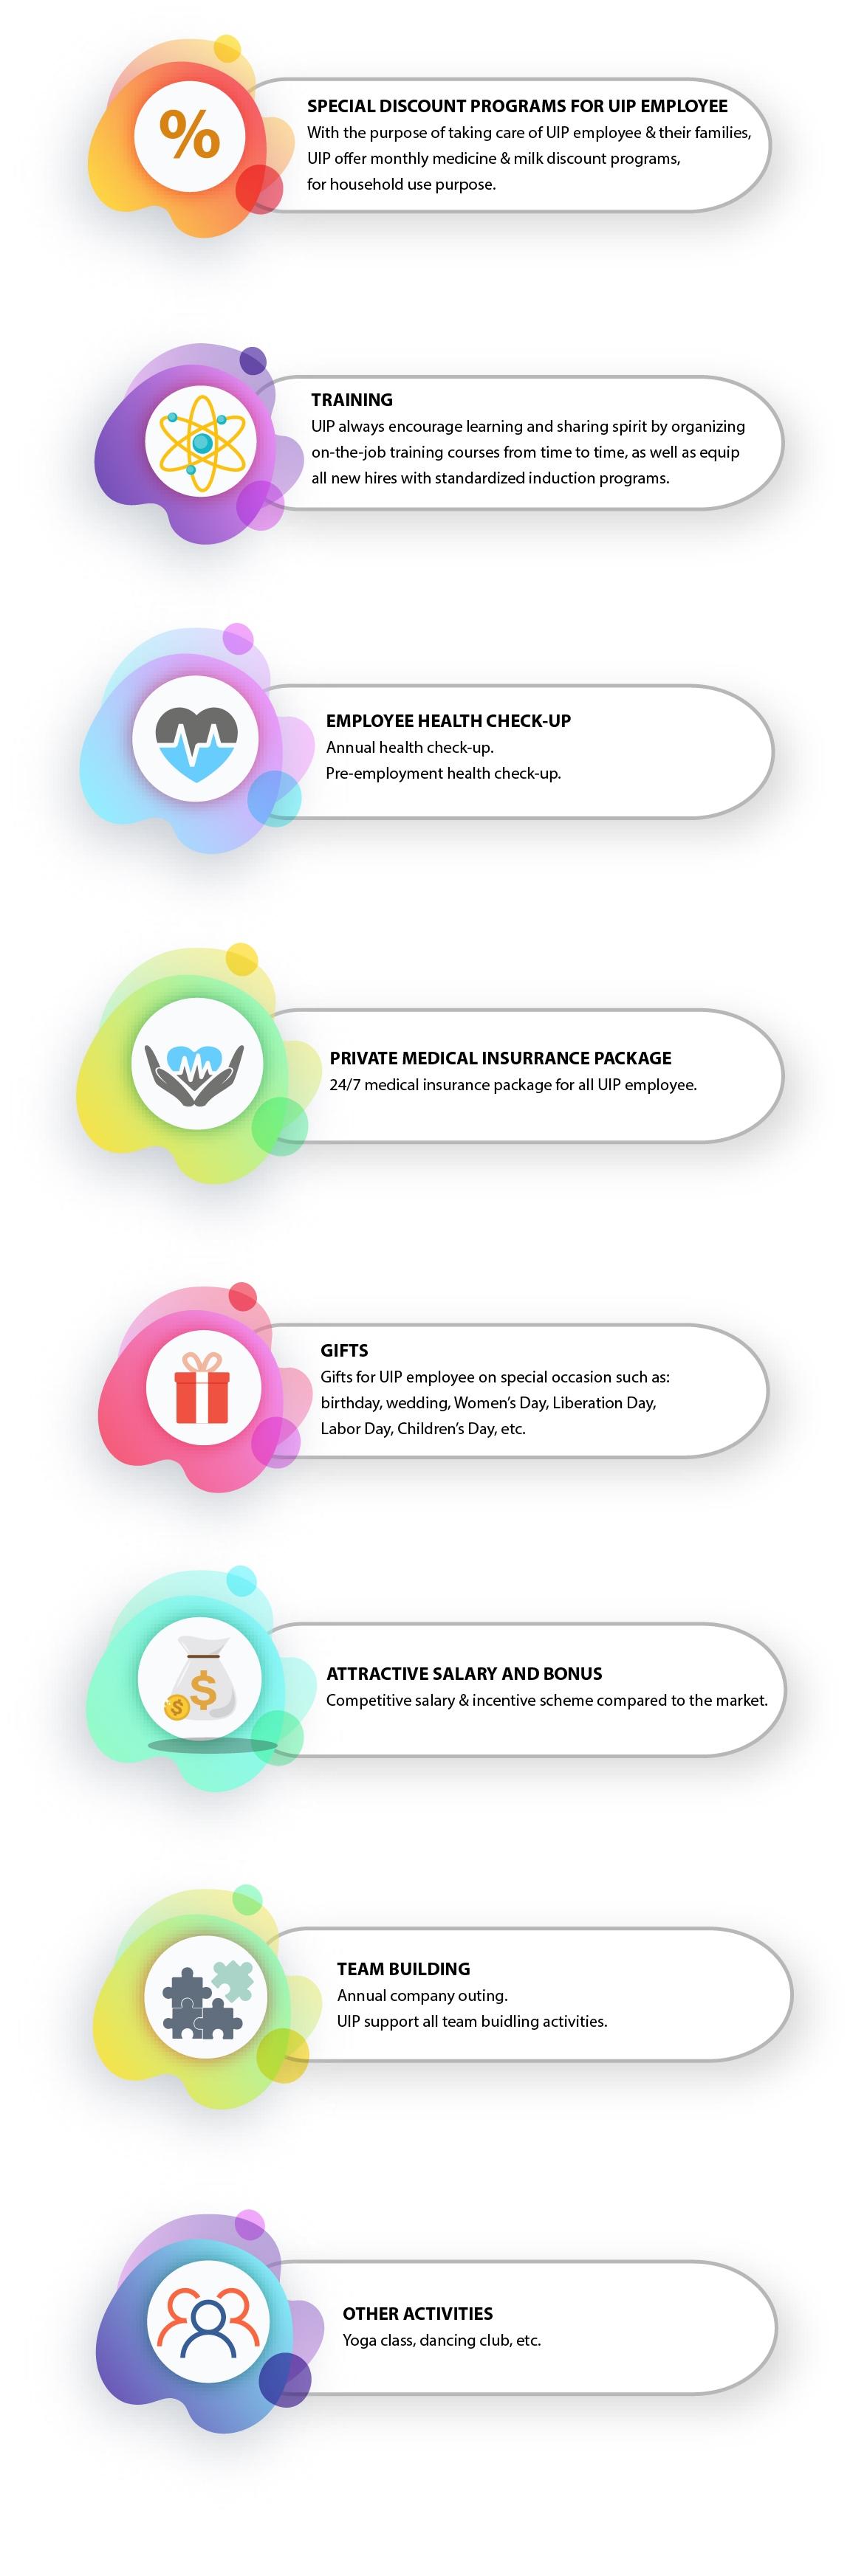 BENEFITS - UNITED INTERNATIONAL PHARMA CO , LTD